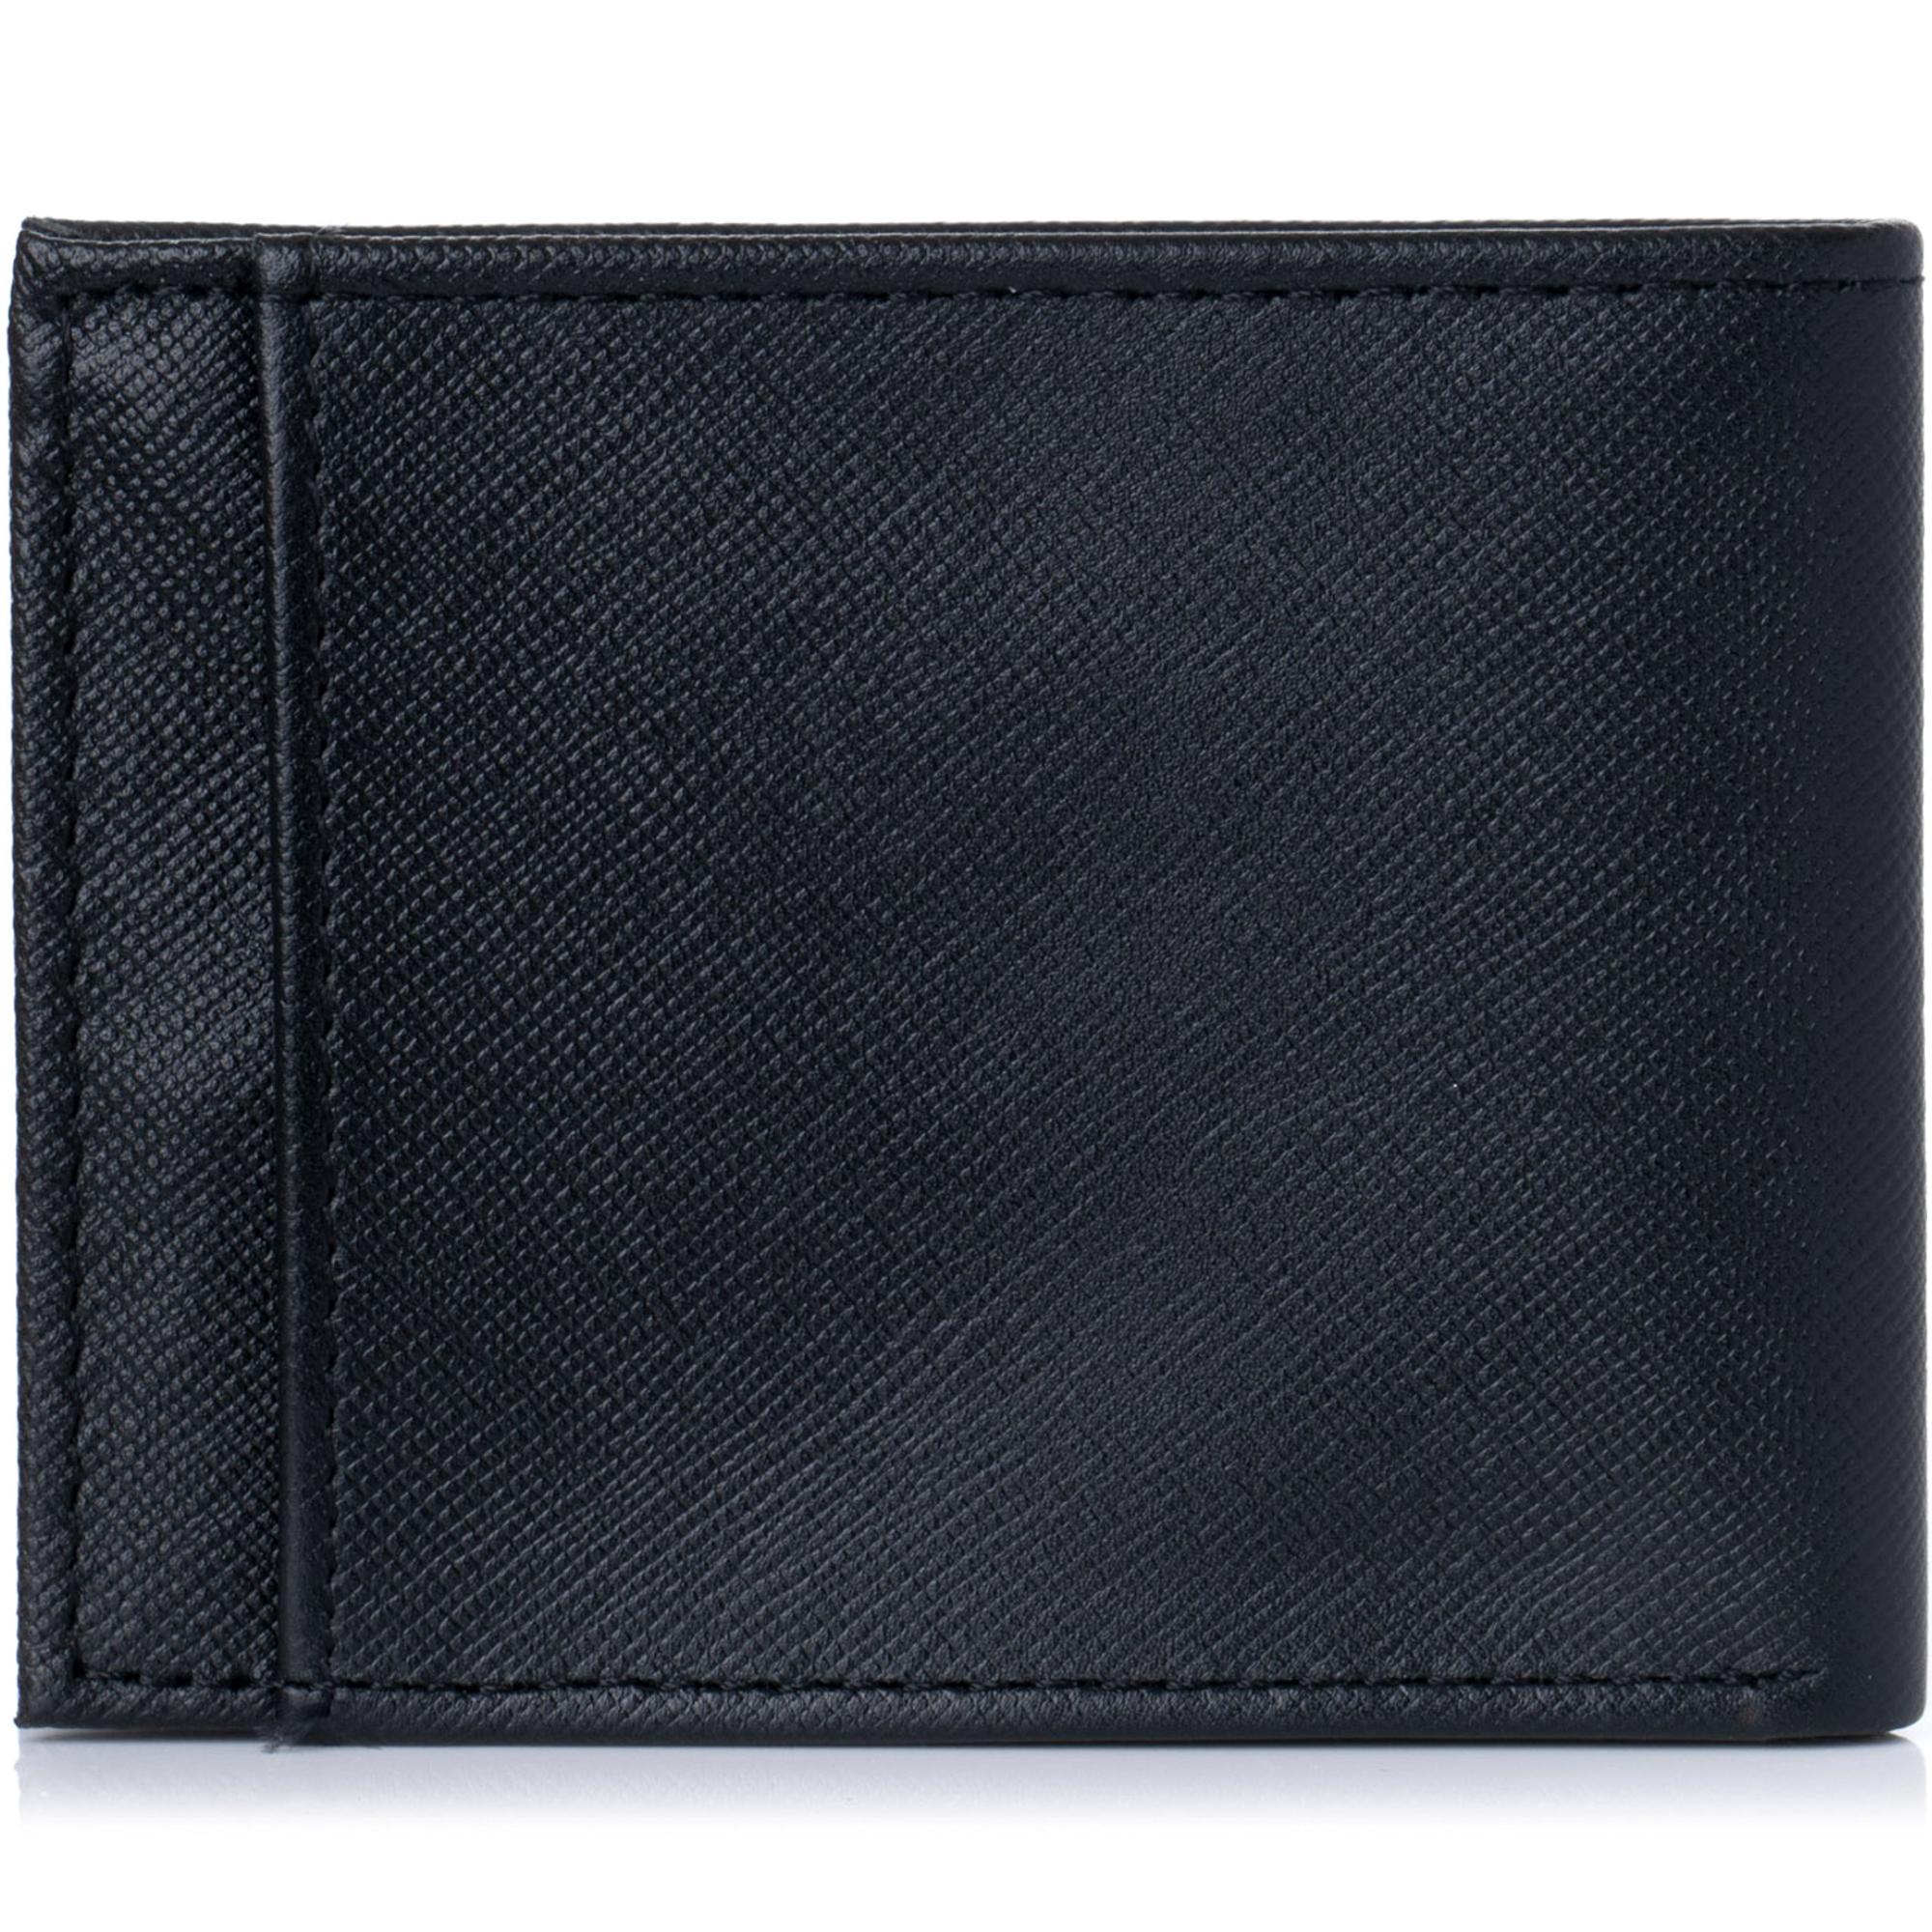 Alpine-Swiss-Mens-Thin-Bifold-Wallet-Top-Grain-Leather-EZ-Access-Outer-Card-Slot thumbnail 49